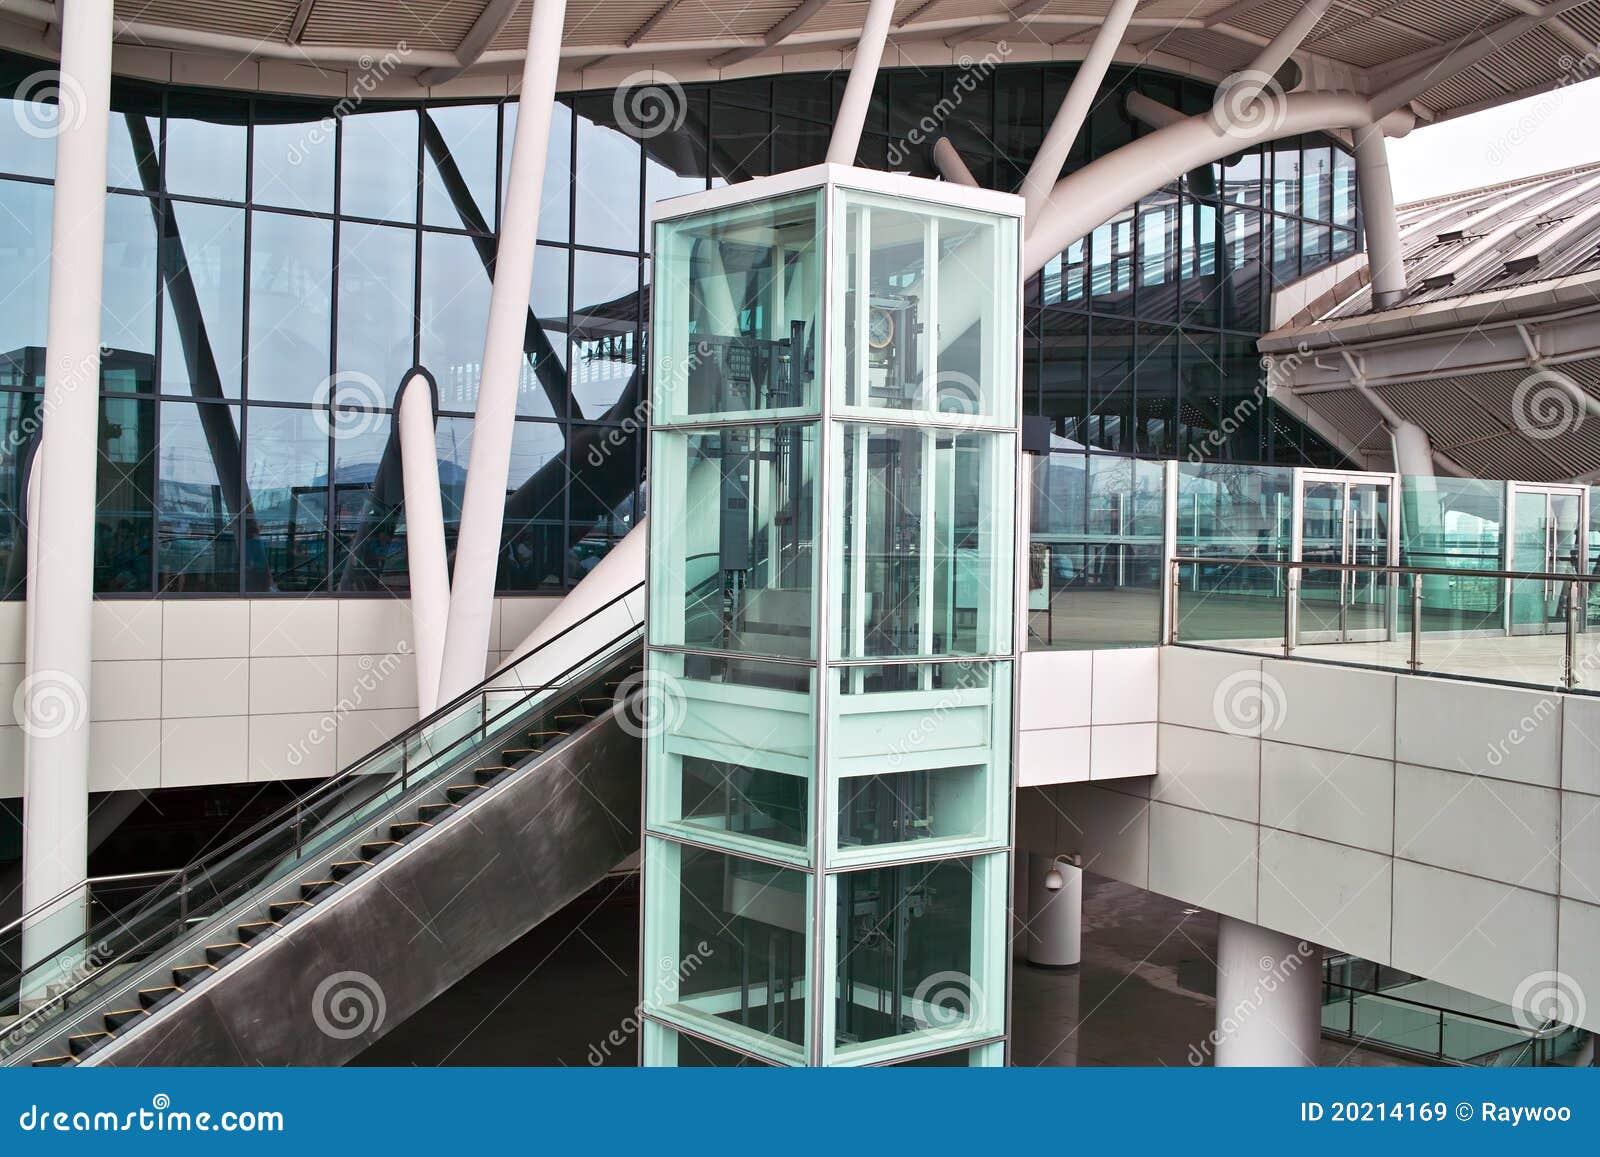 ascenseur et escalator en verre image stock image du structure public 20214169. Black Bedroom Furniture Sets. Home Design Ideas